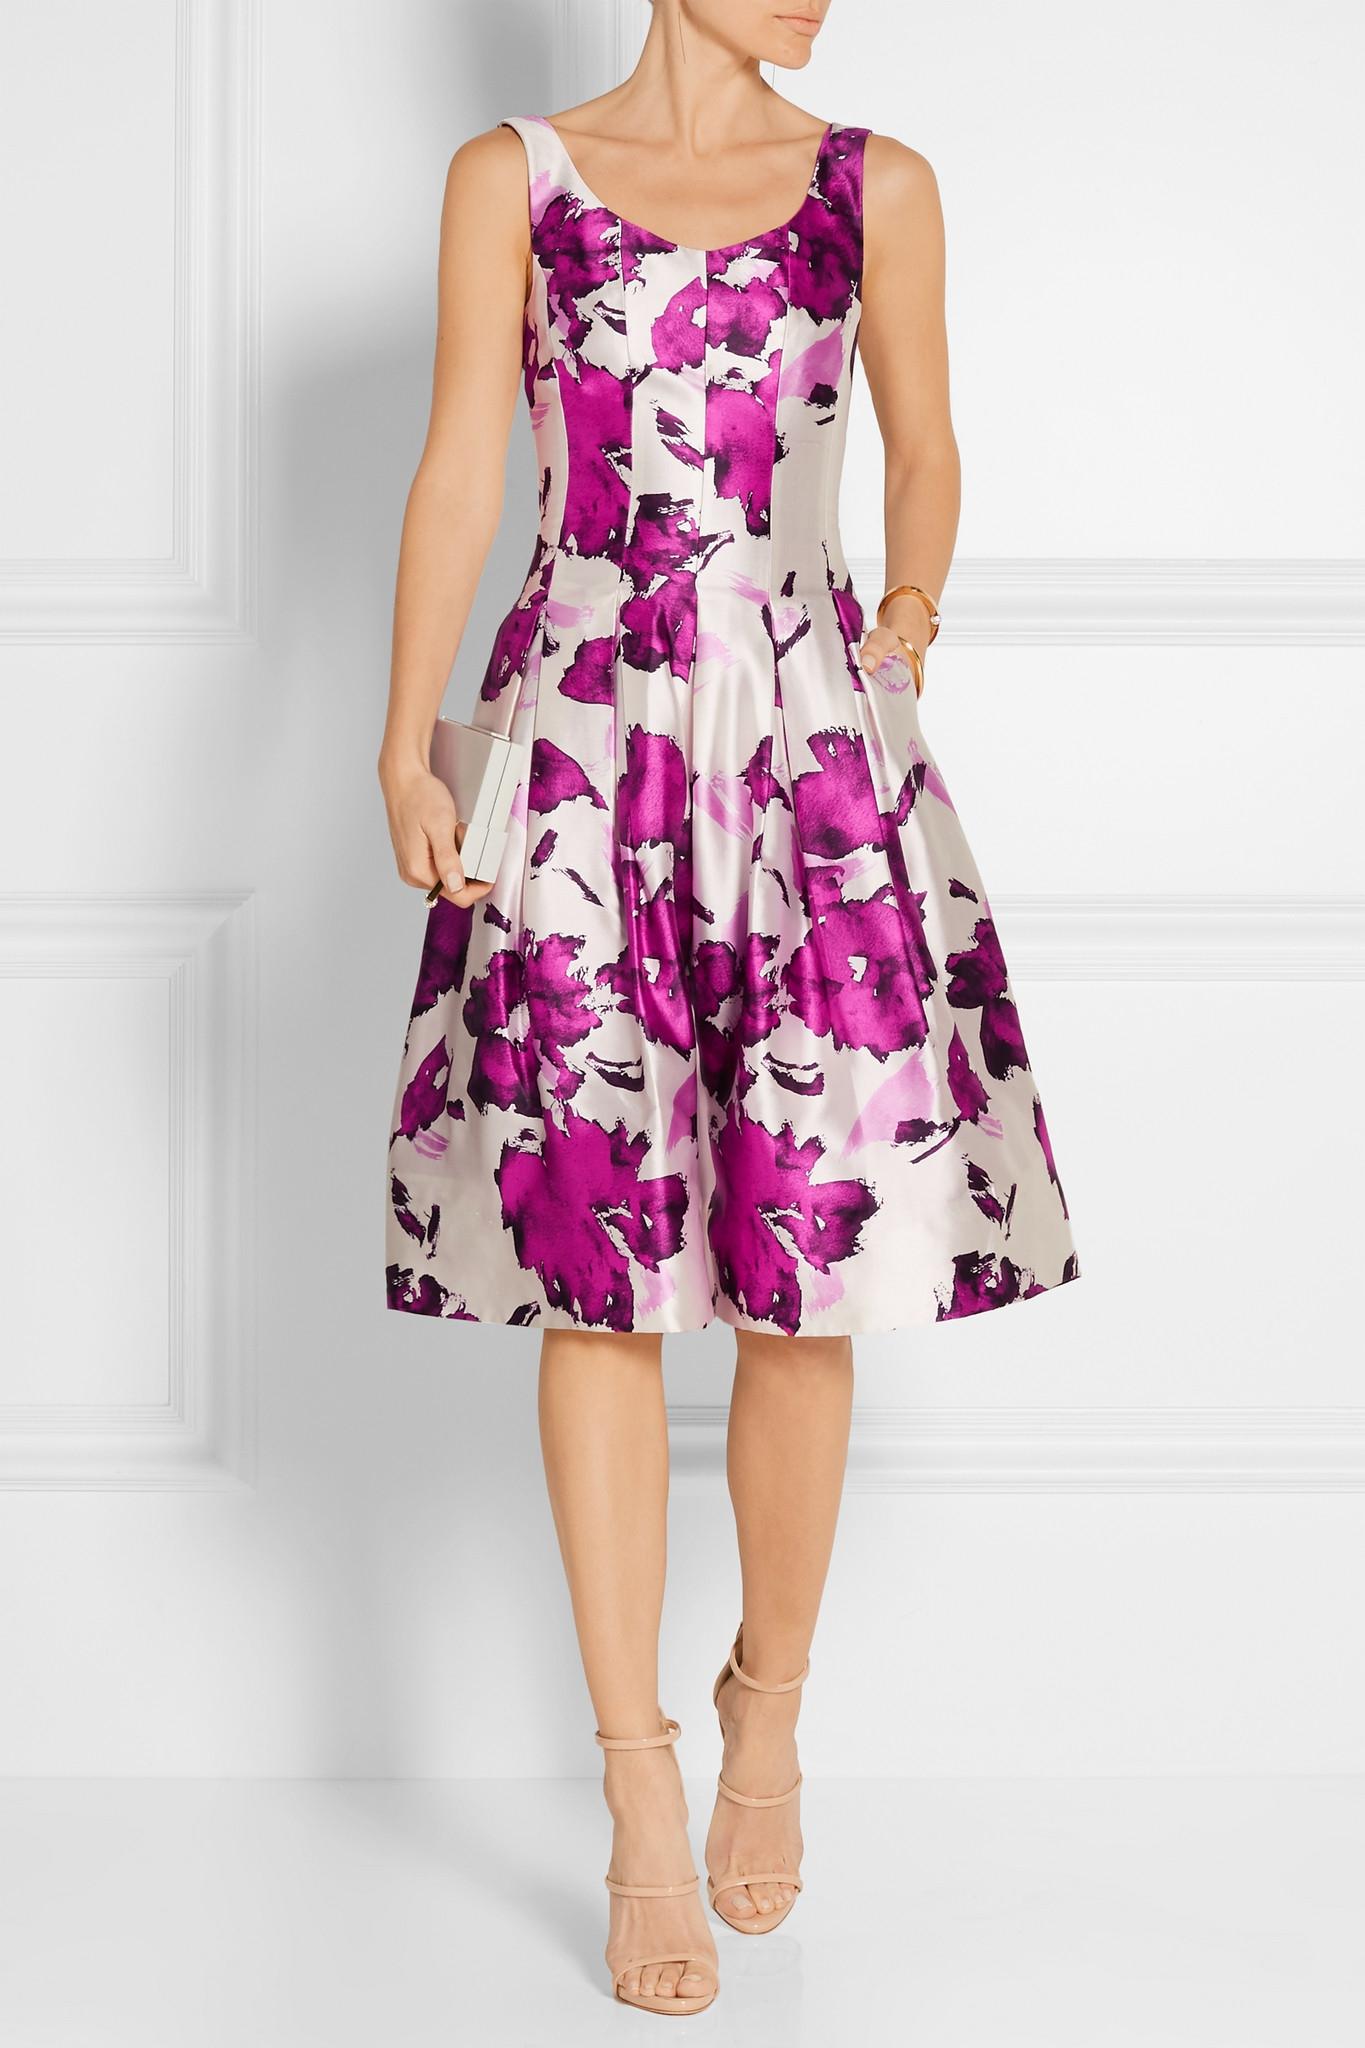 floral-print pleated dress - White Oscar De La Renta oBWtIvHW